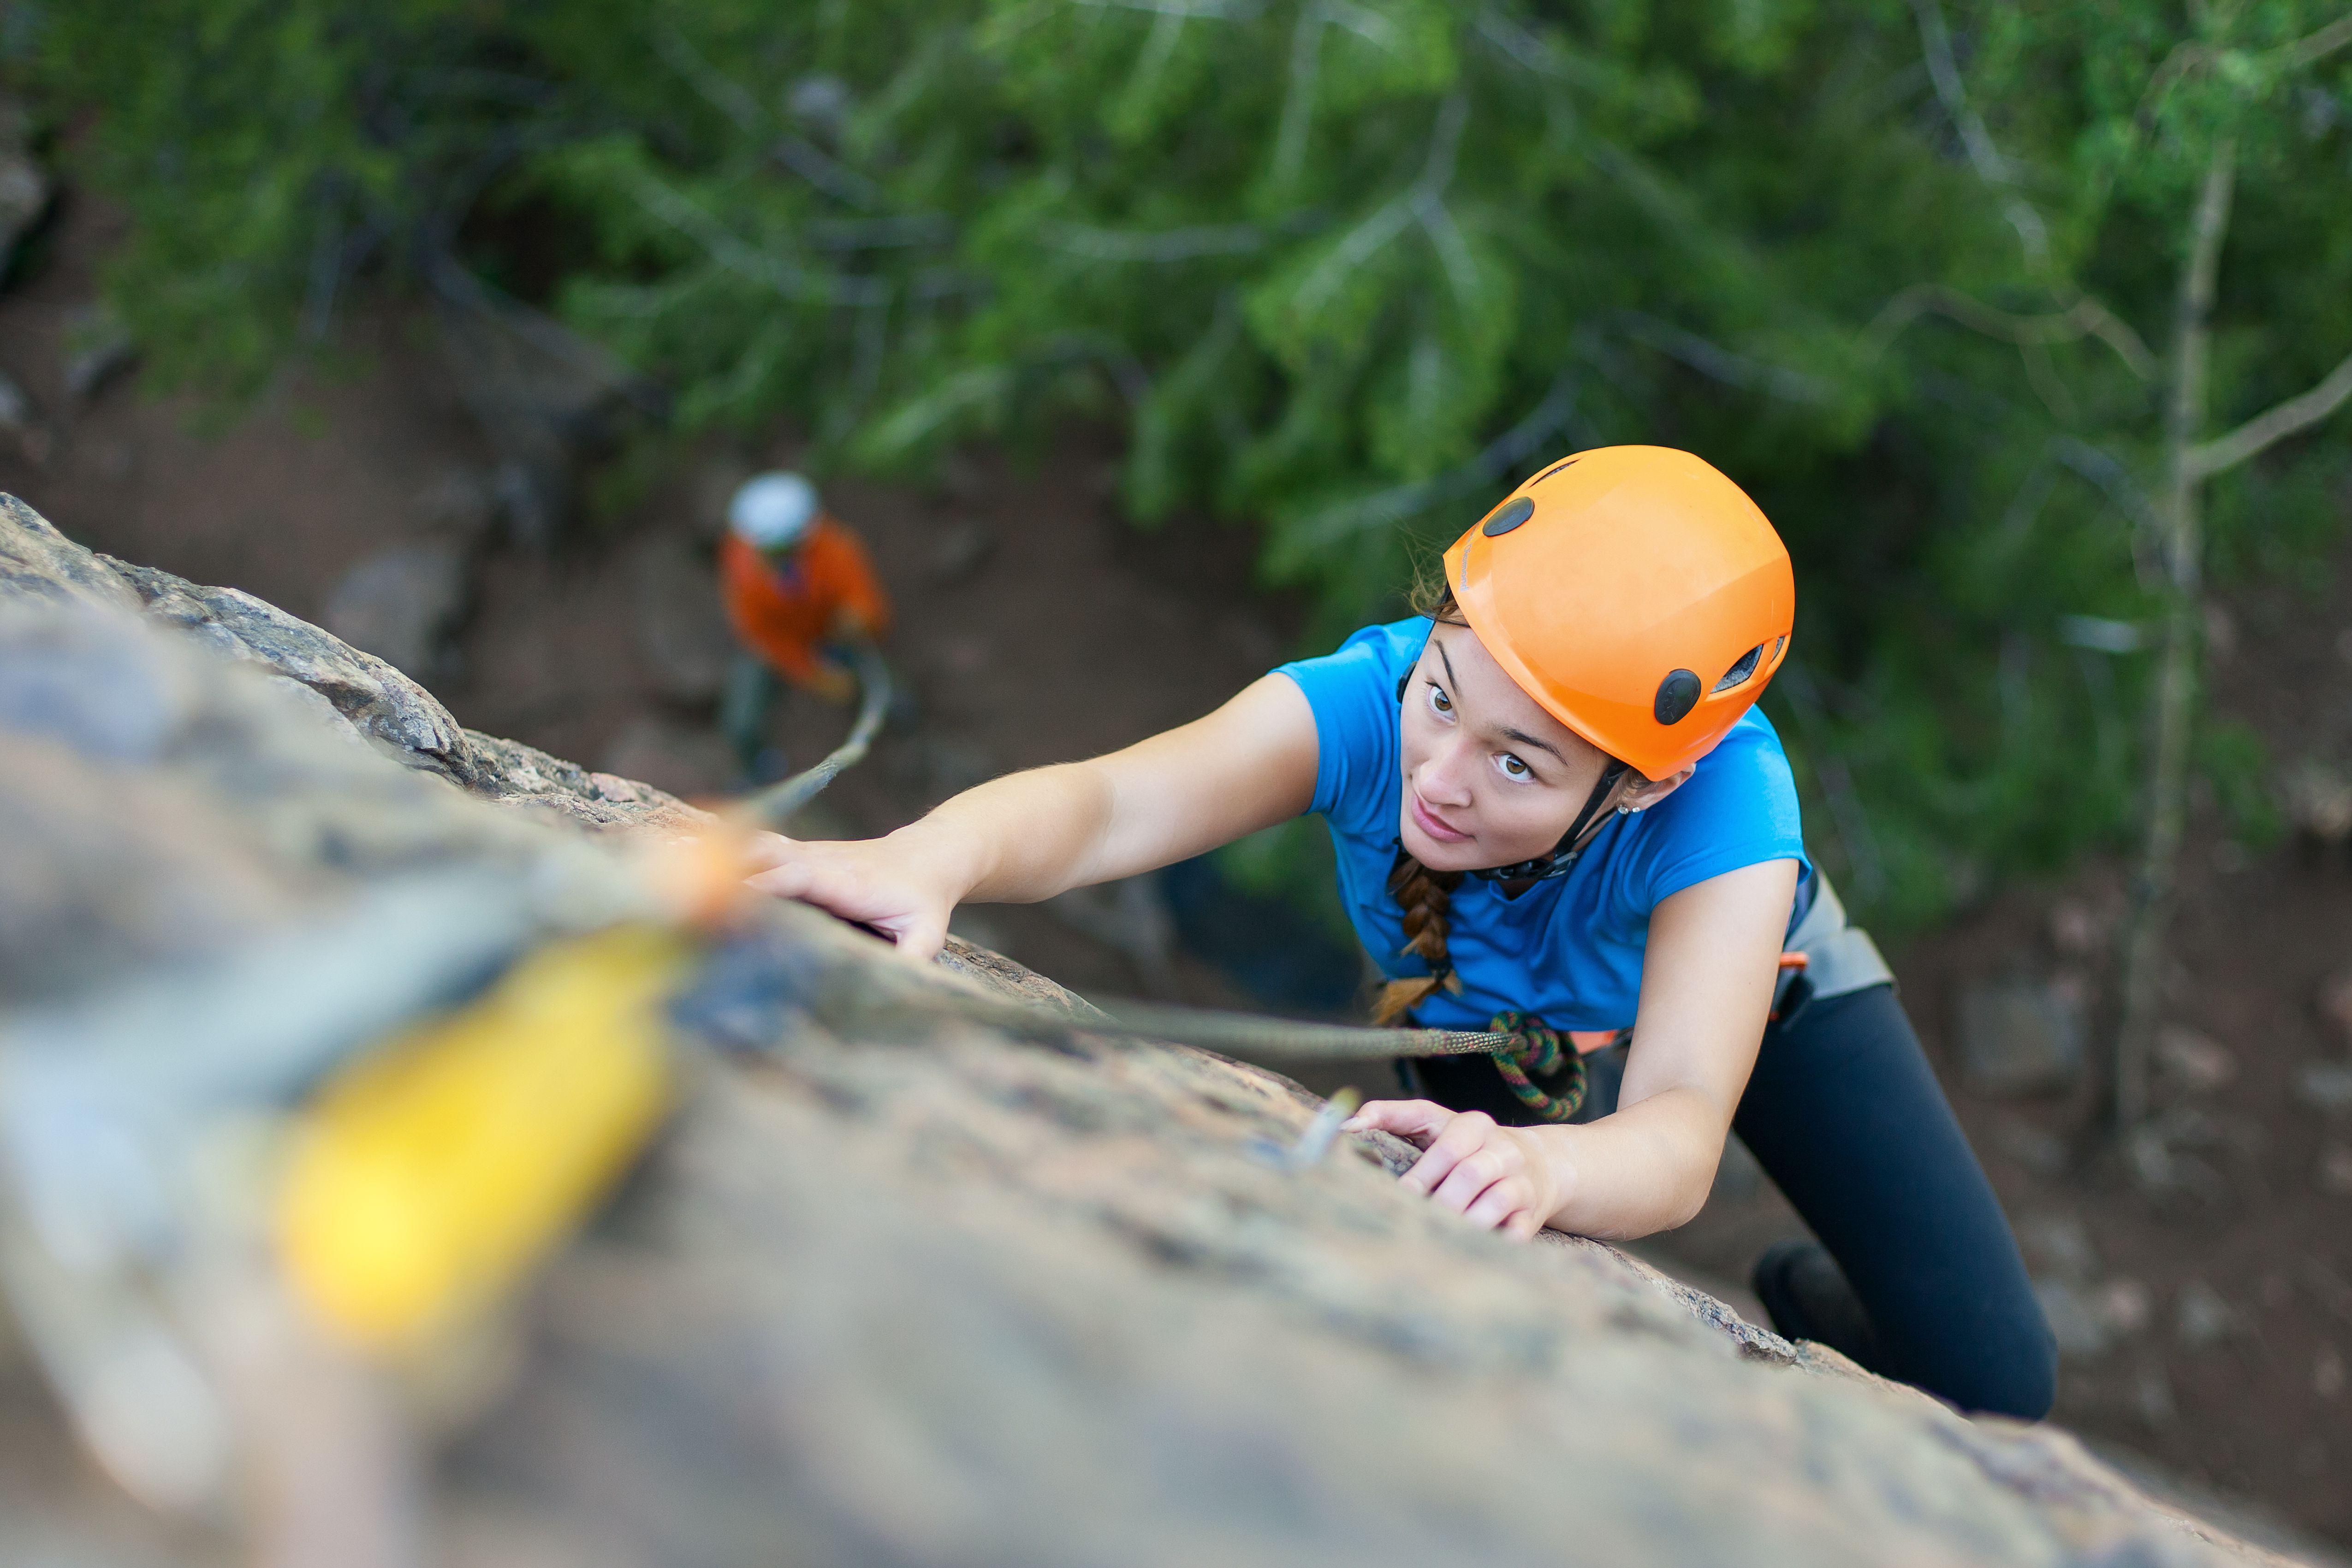 Focused young girl rock climbing.